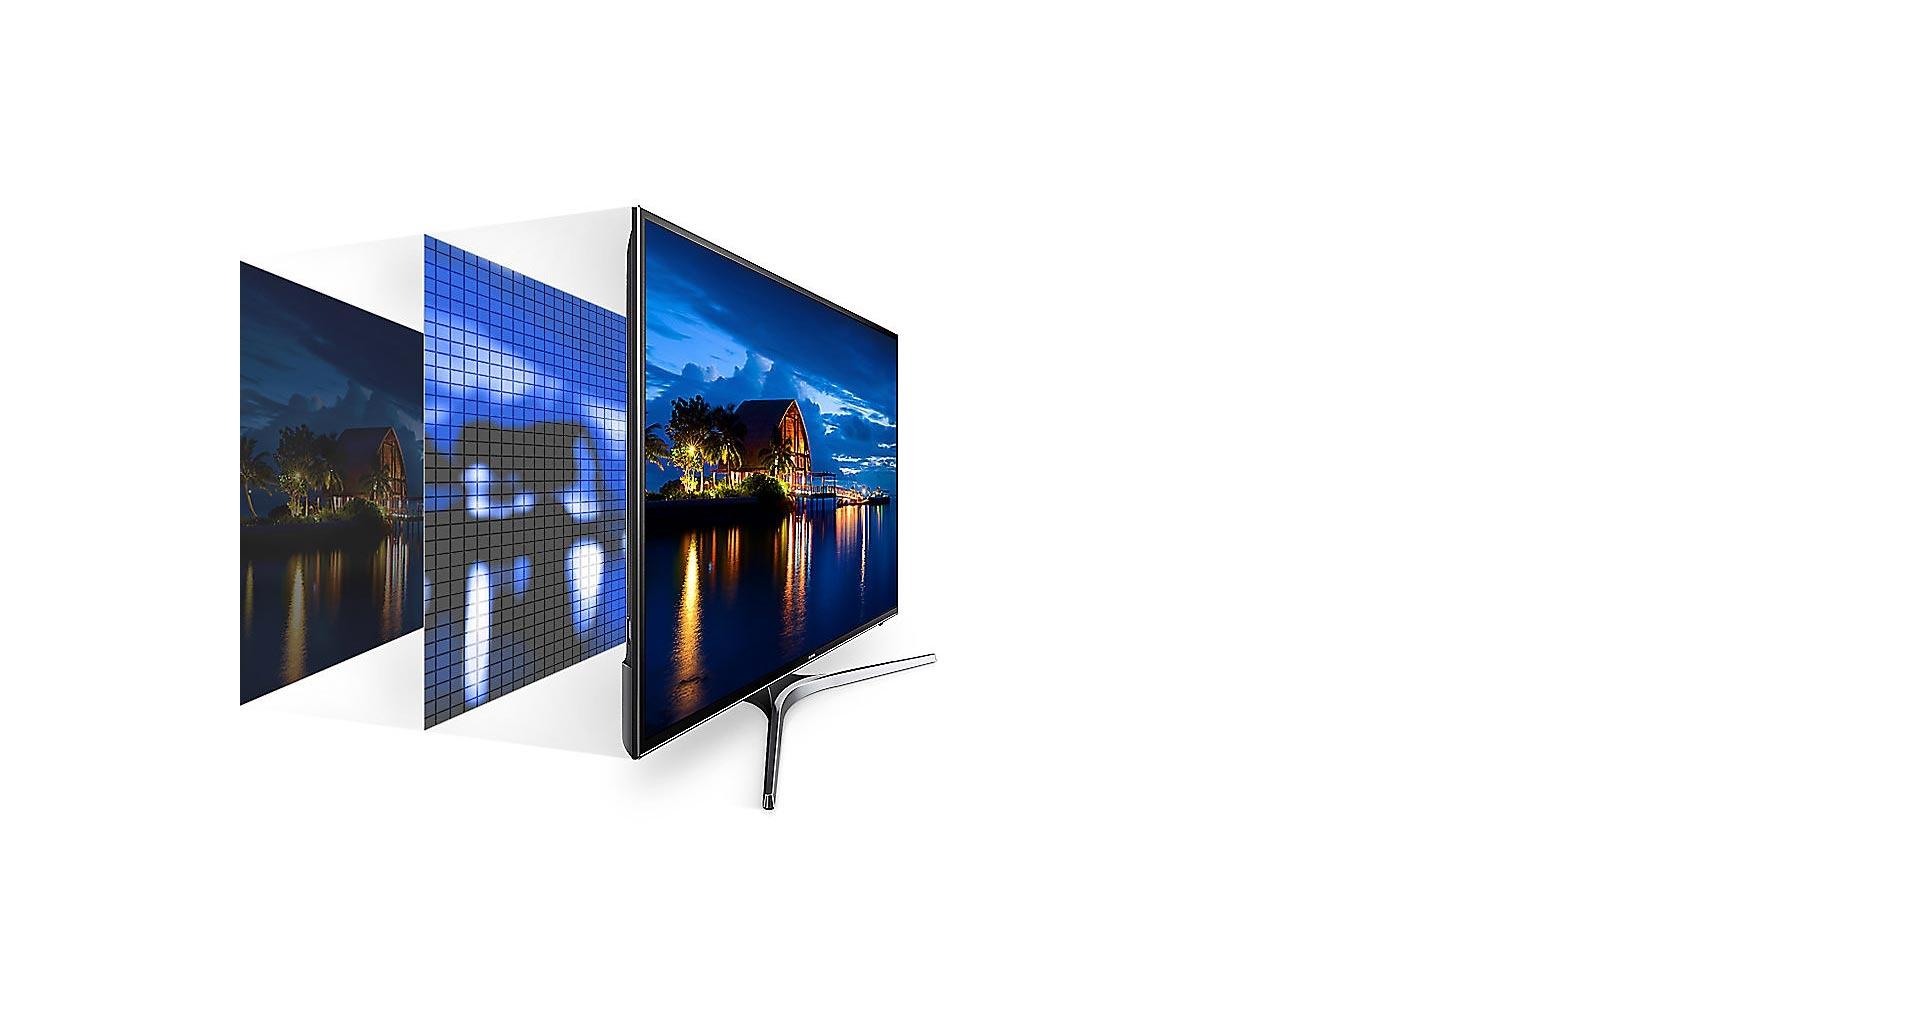 تنظیم رنگ توسط تکنولوژی UHD Dimming تلویزیون NU7900